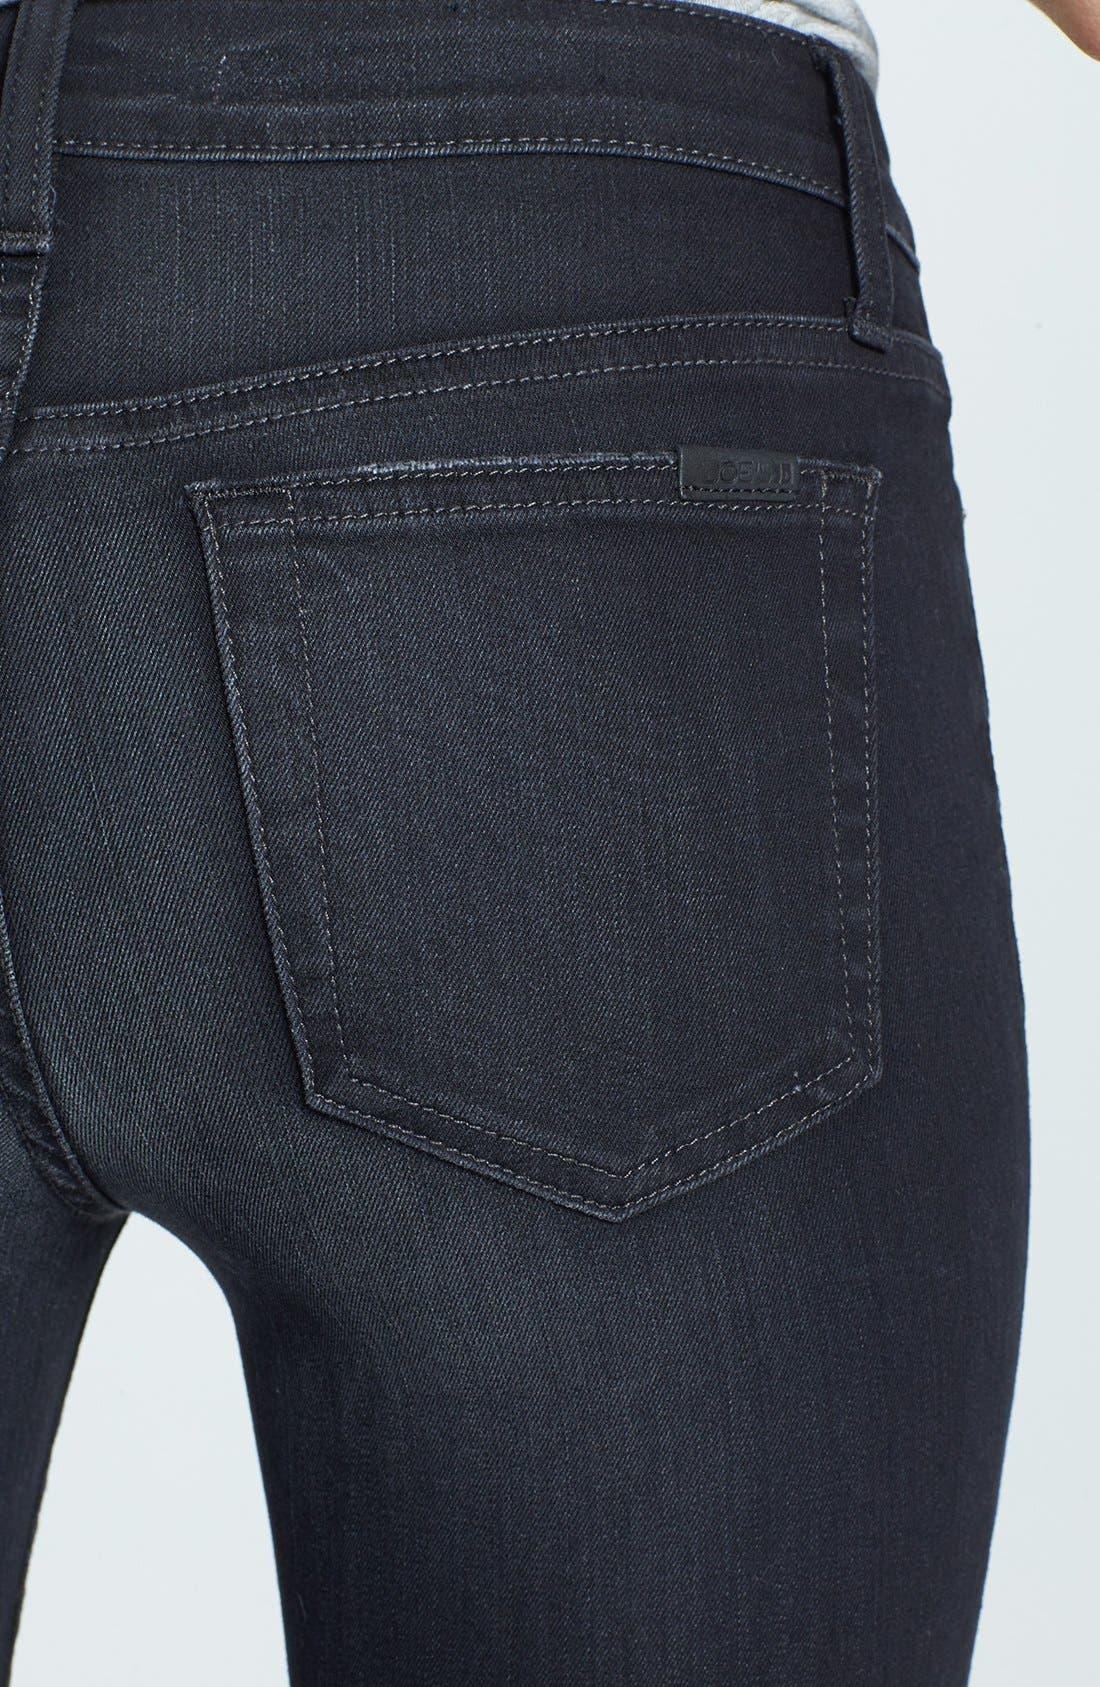 Alternate Image 3  - Joe's 'Beckie' Stretch Skinny Jeans